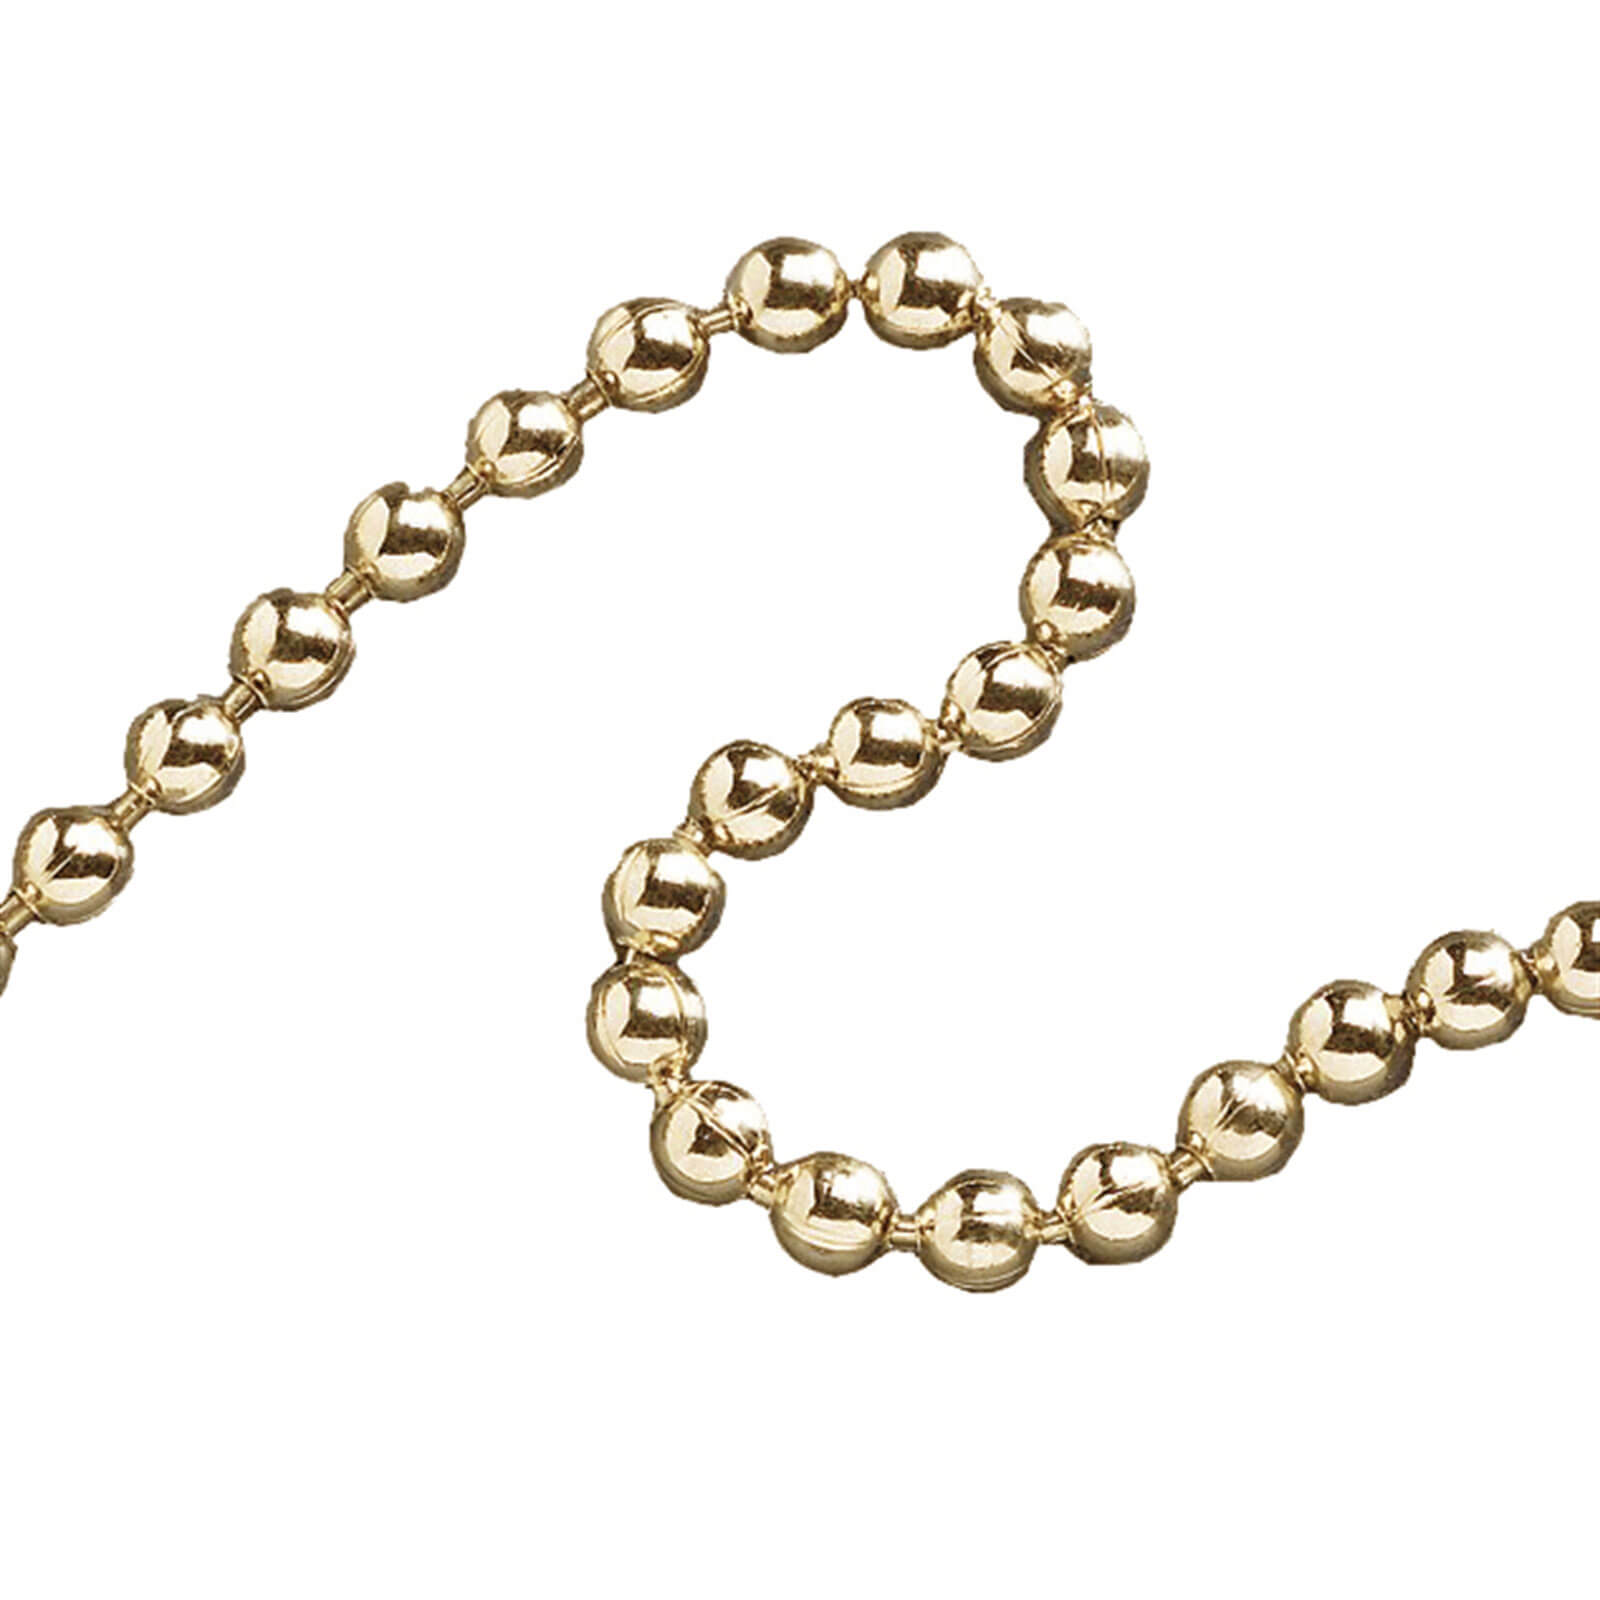 Faithfull Ball Chain Polished Brass 3.2mm 10m